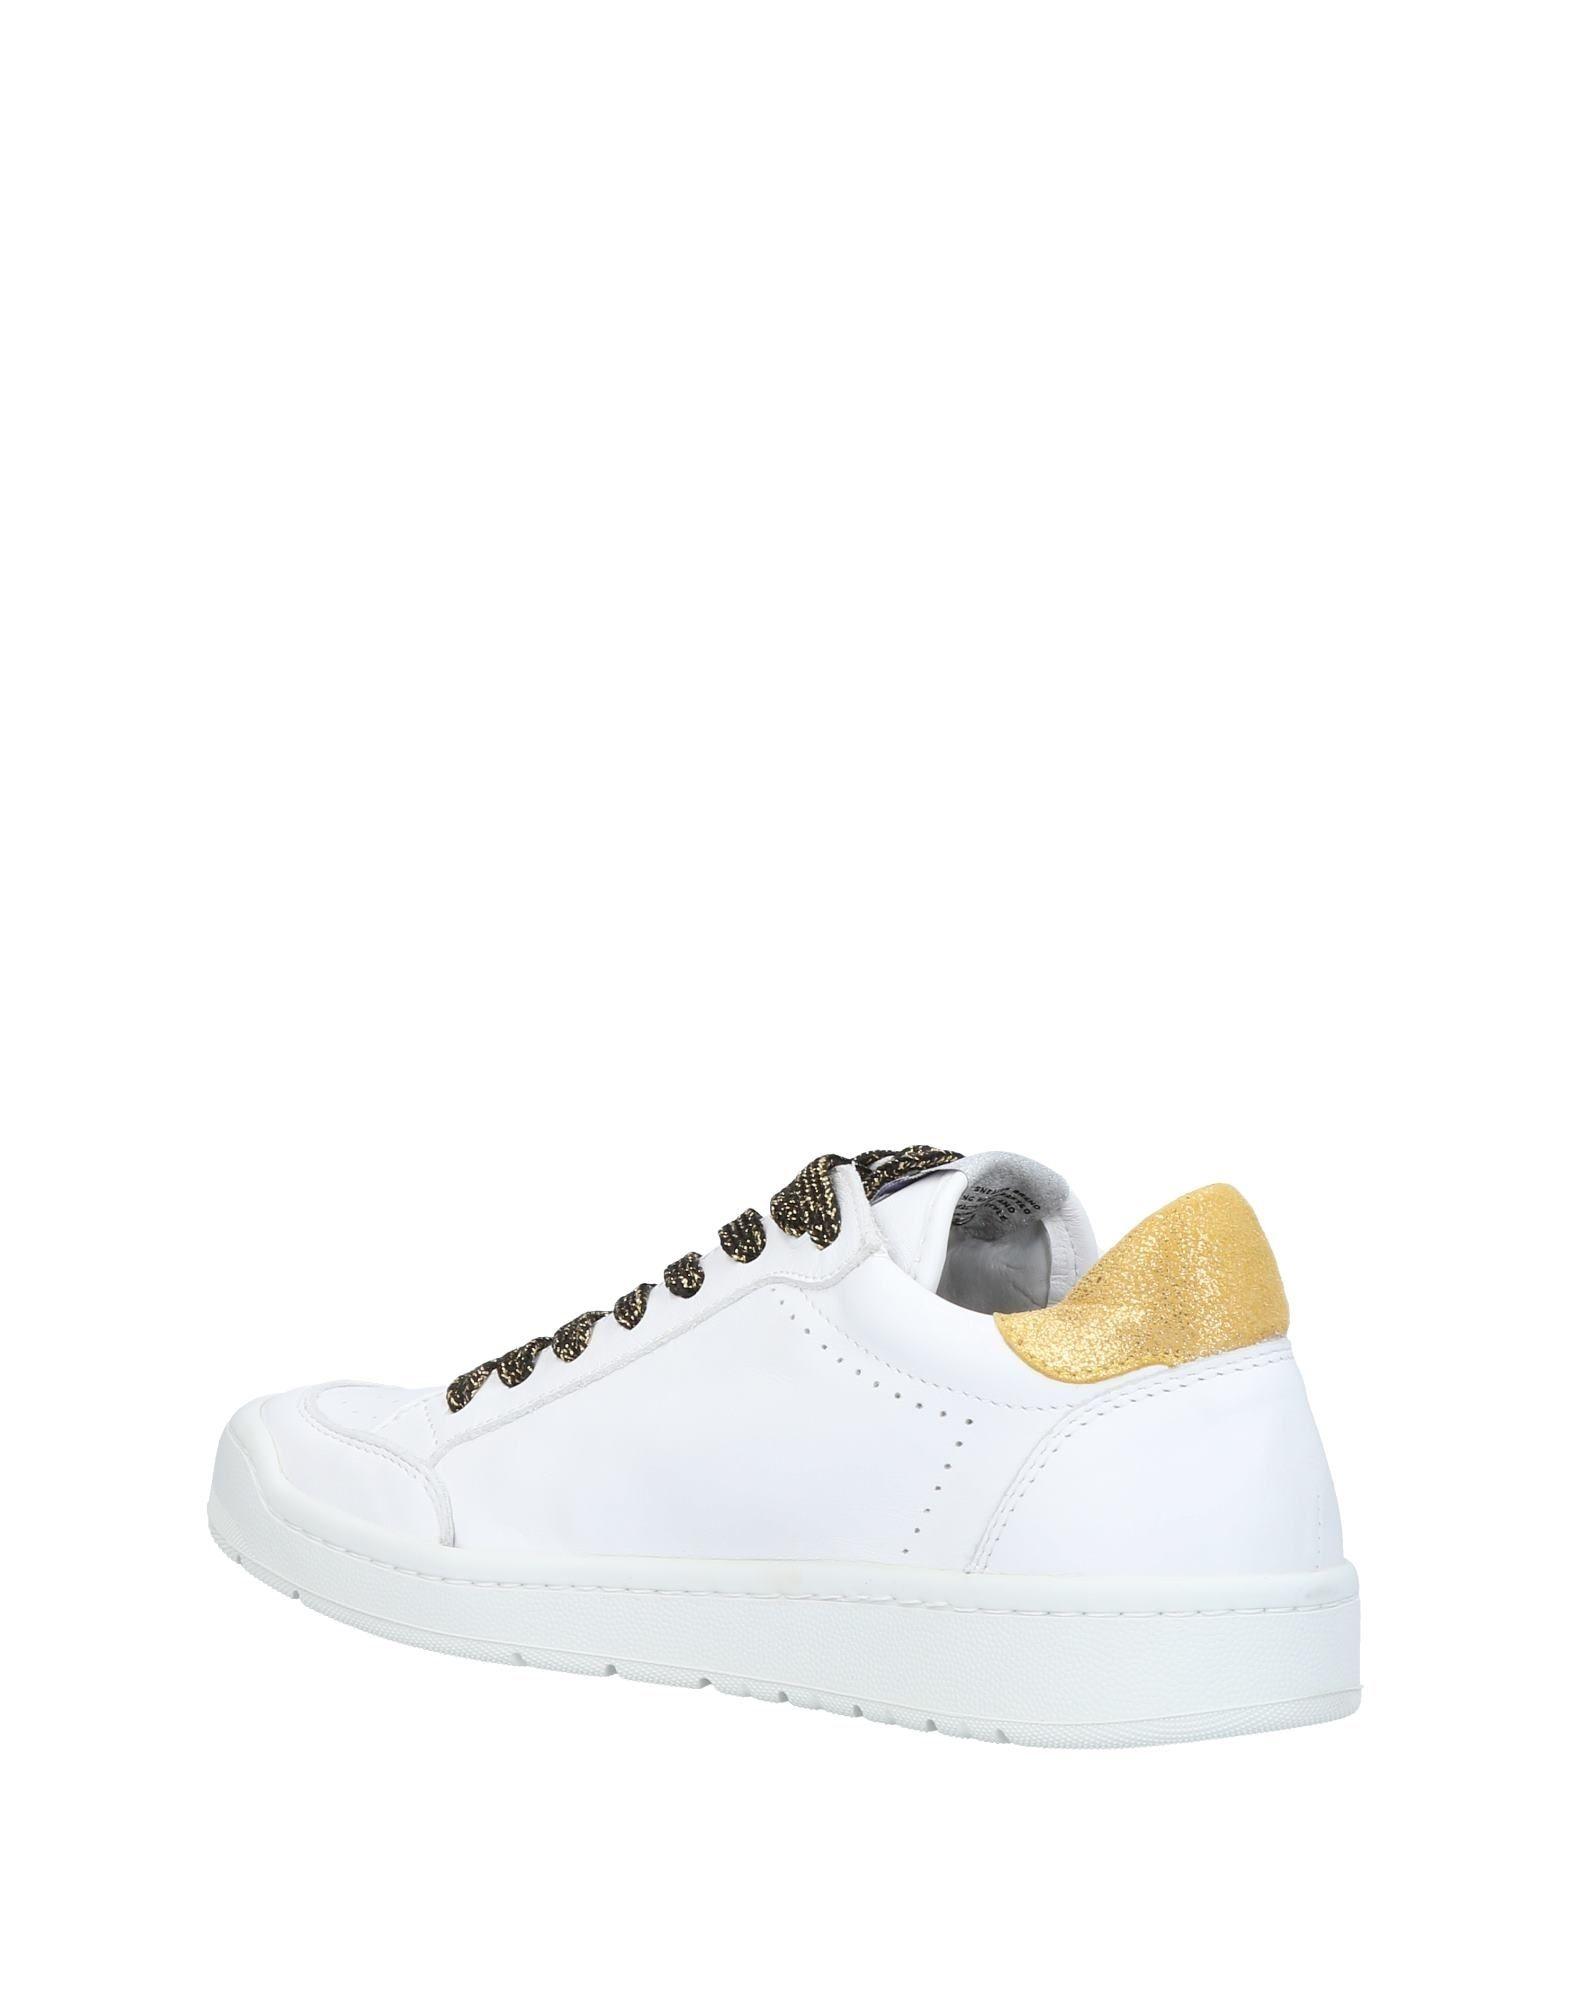 Sneakers Serafini Serafini Serafini Luxury Donna - 11426338IX 6f1891